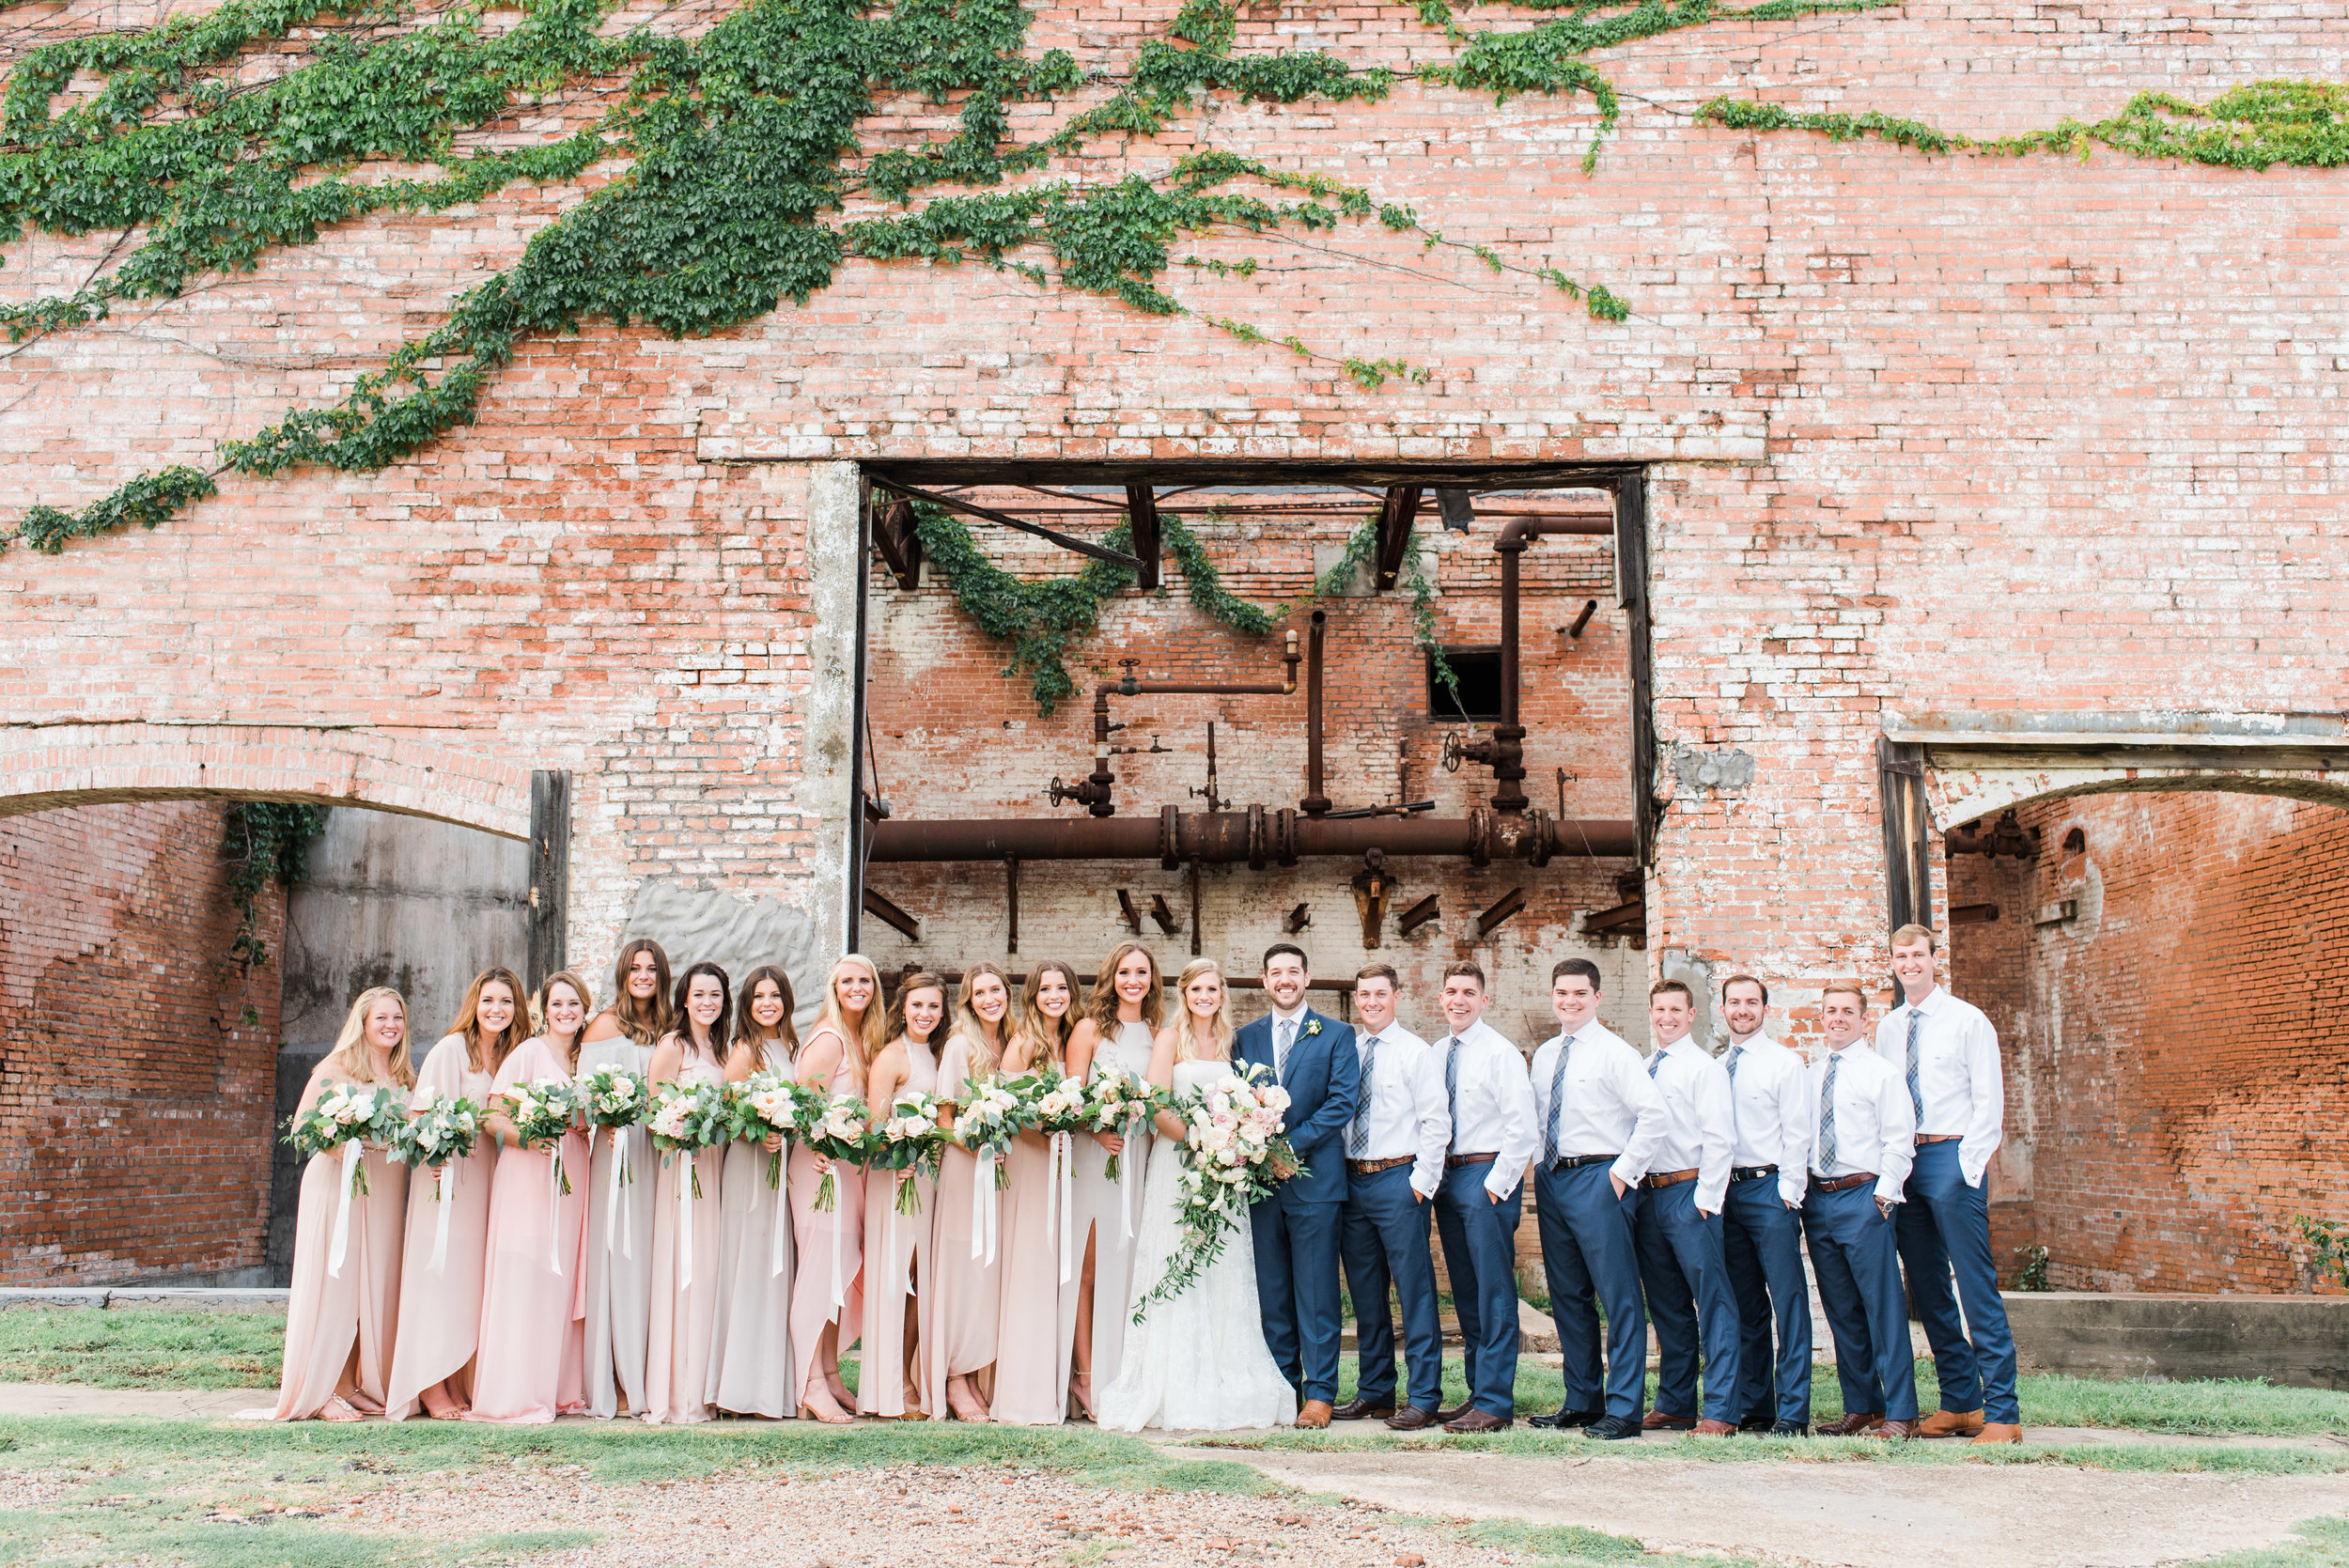 gray-door-photography-wedding-portraits-dallas-photographer-steph-erffmeyer2.jpg